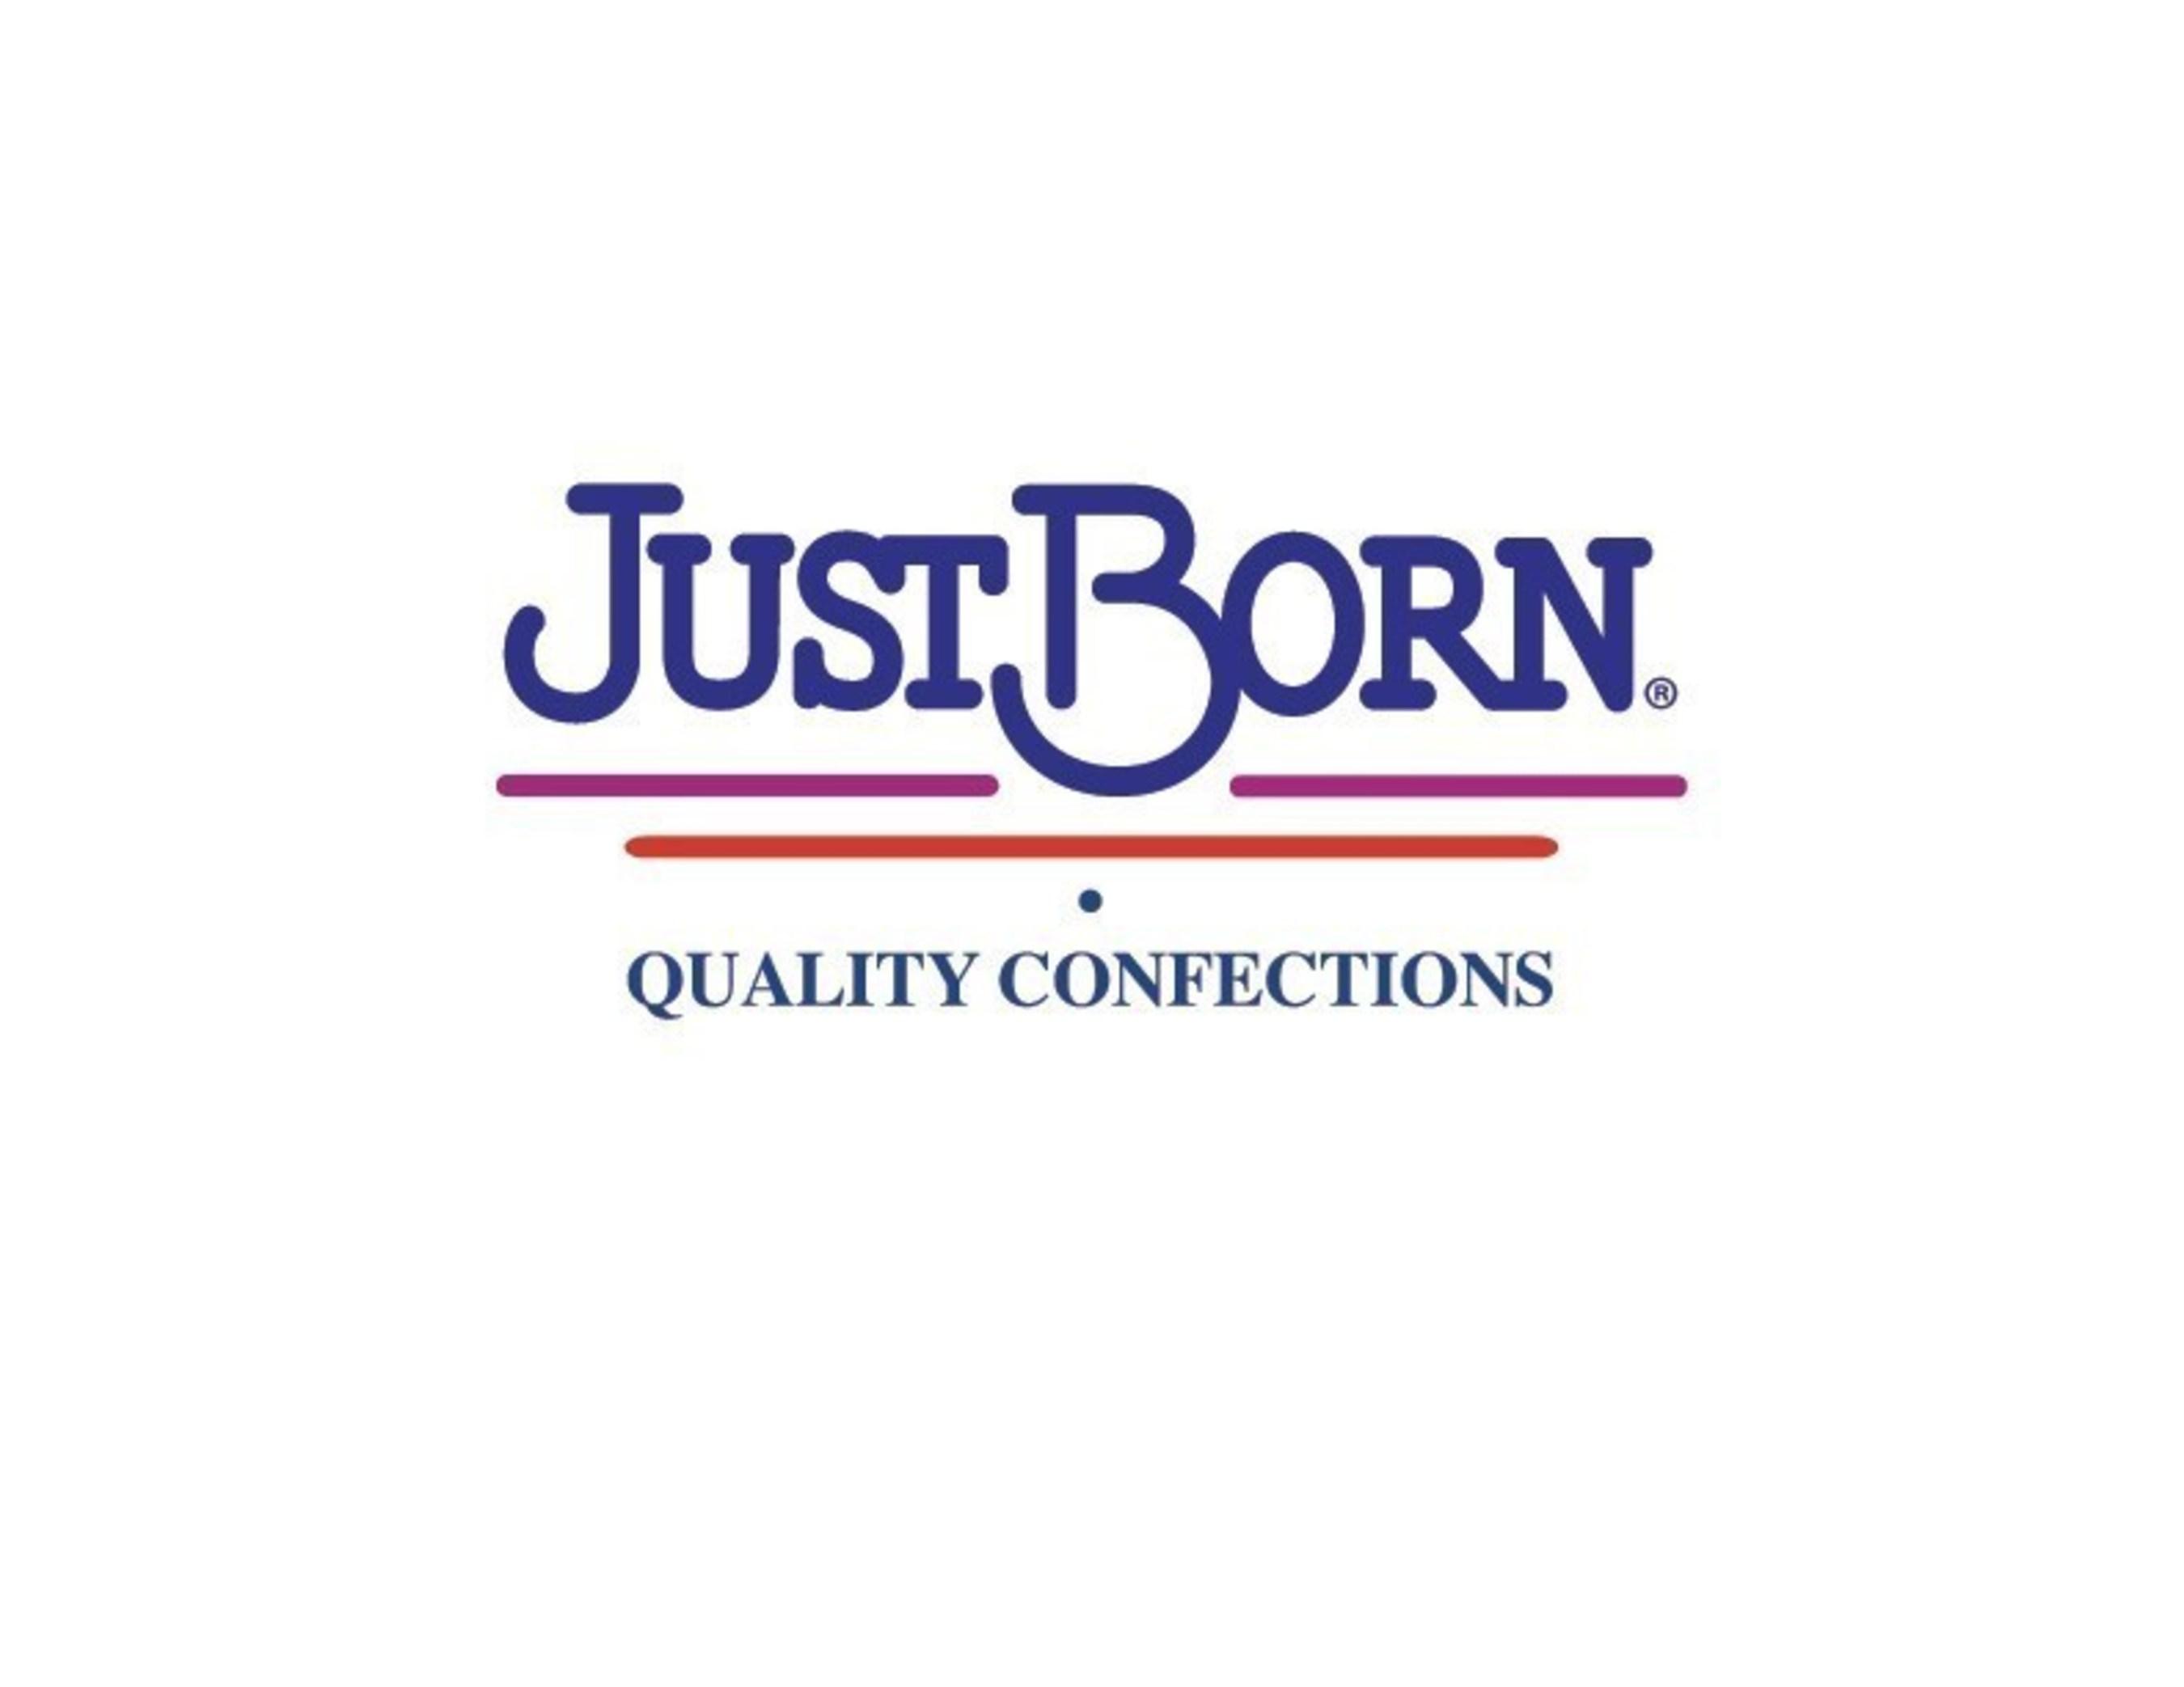 Just Born logo